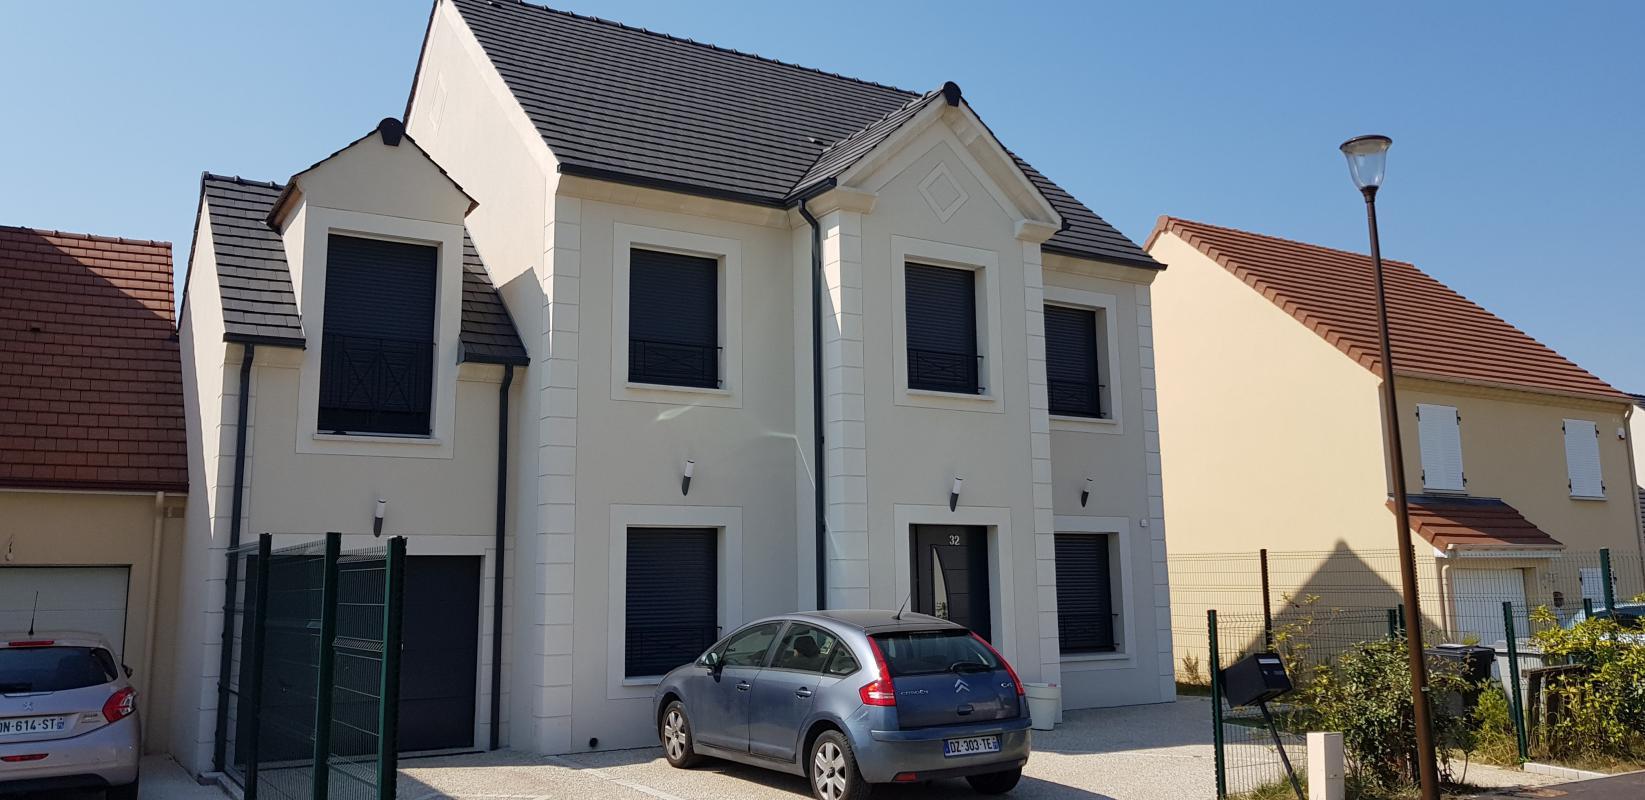 Terrains du constructeur LDP • 350 m² • VERNEUIL EN HALATTE